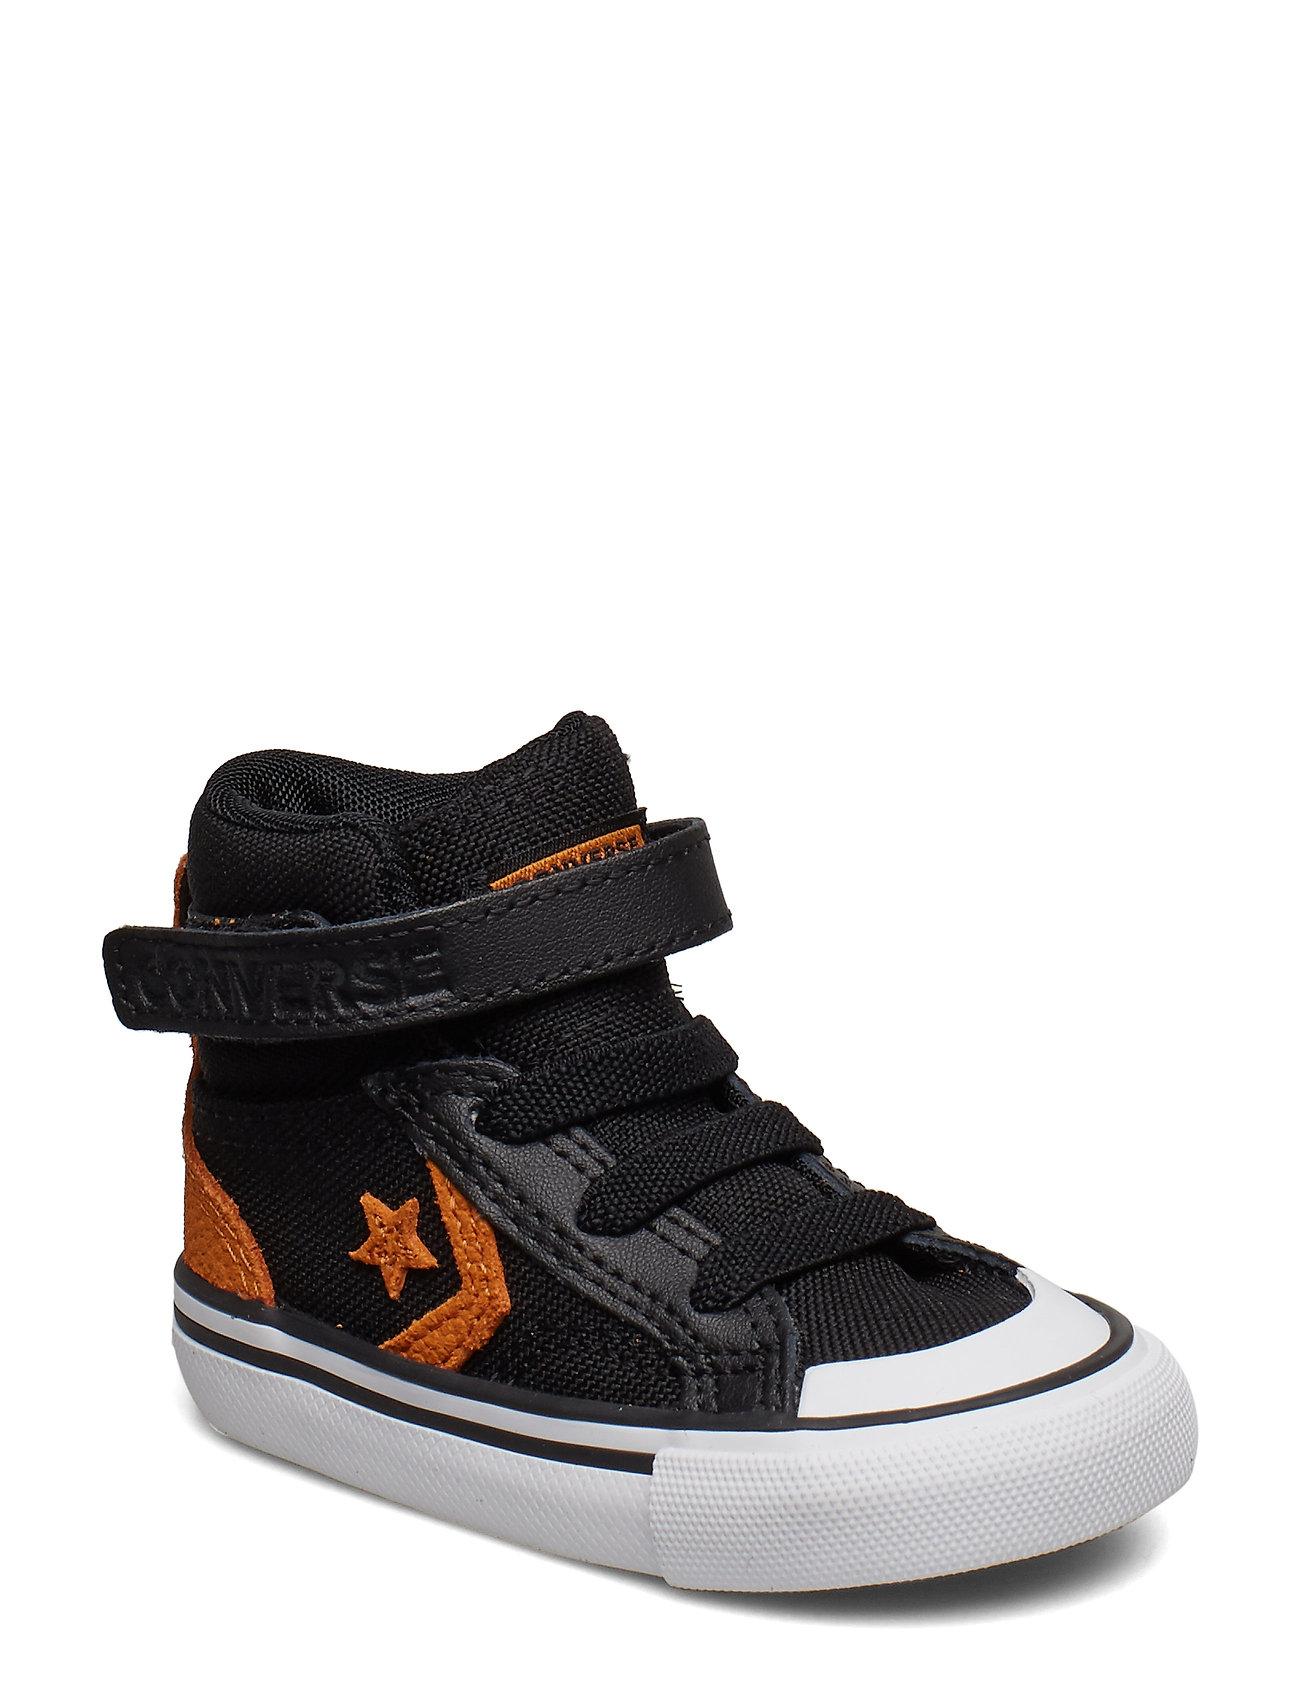 Pro Blaze Strap Hi Tennarit Sneakerit Kengät Musta Converse